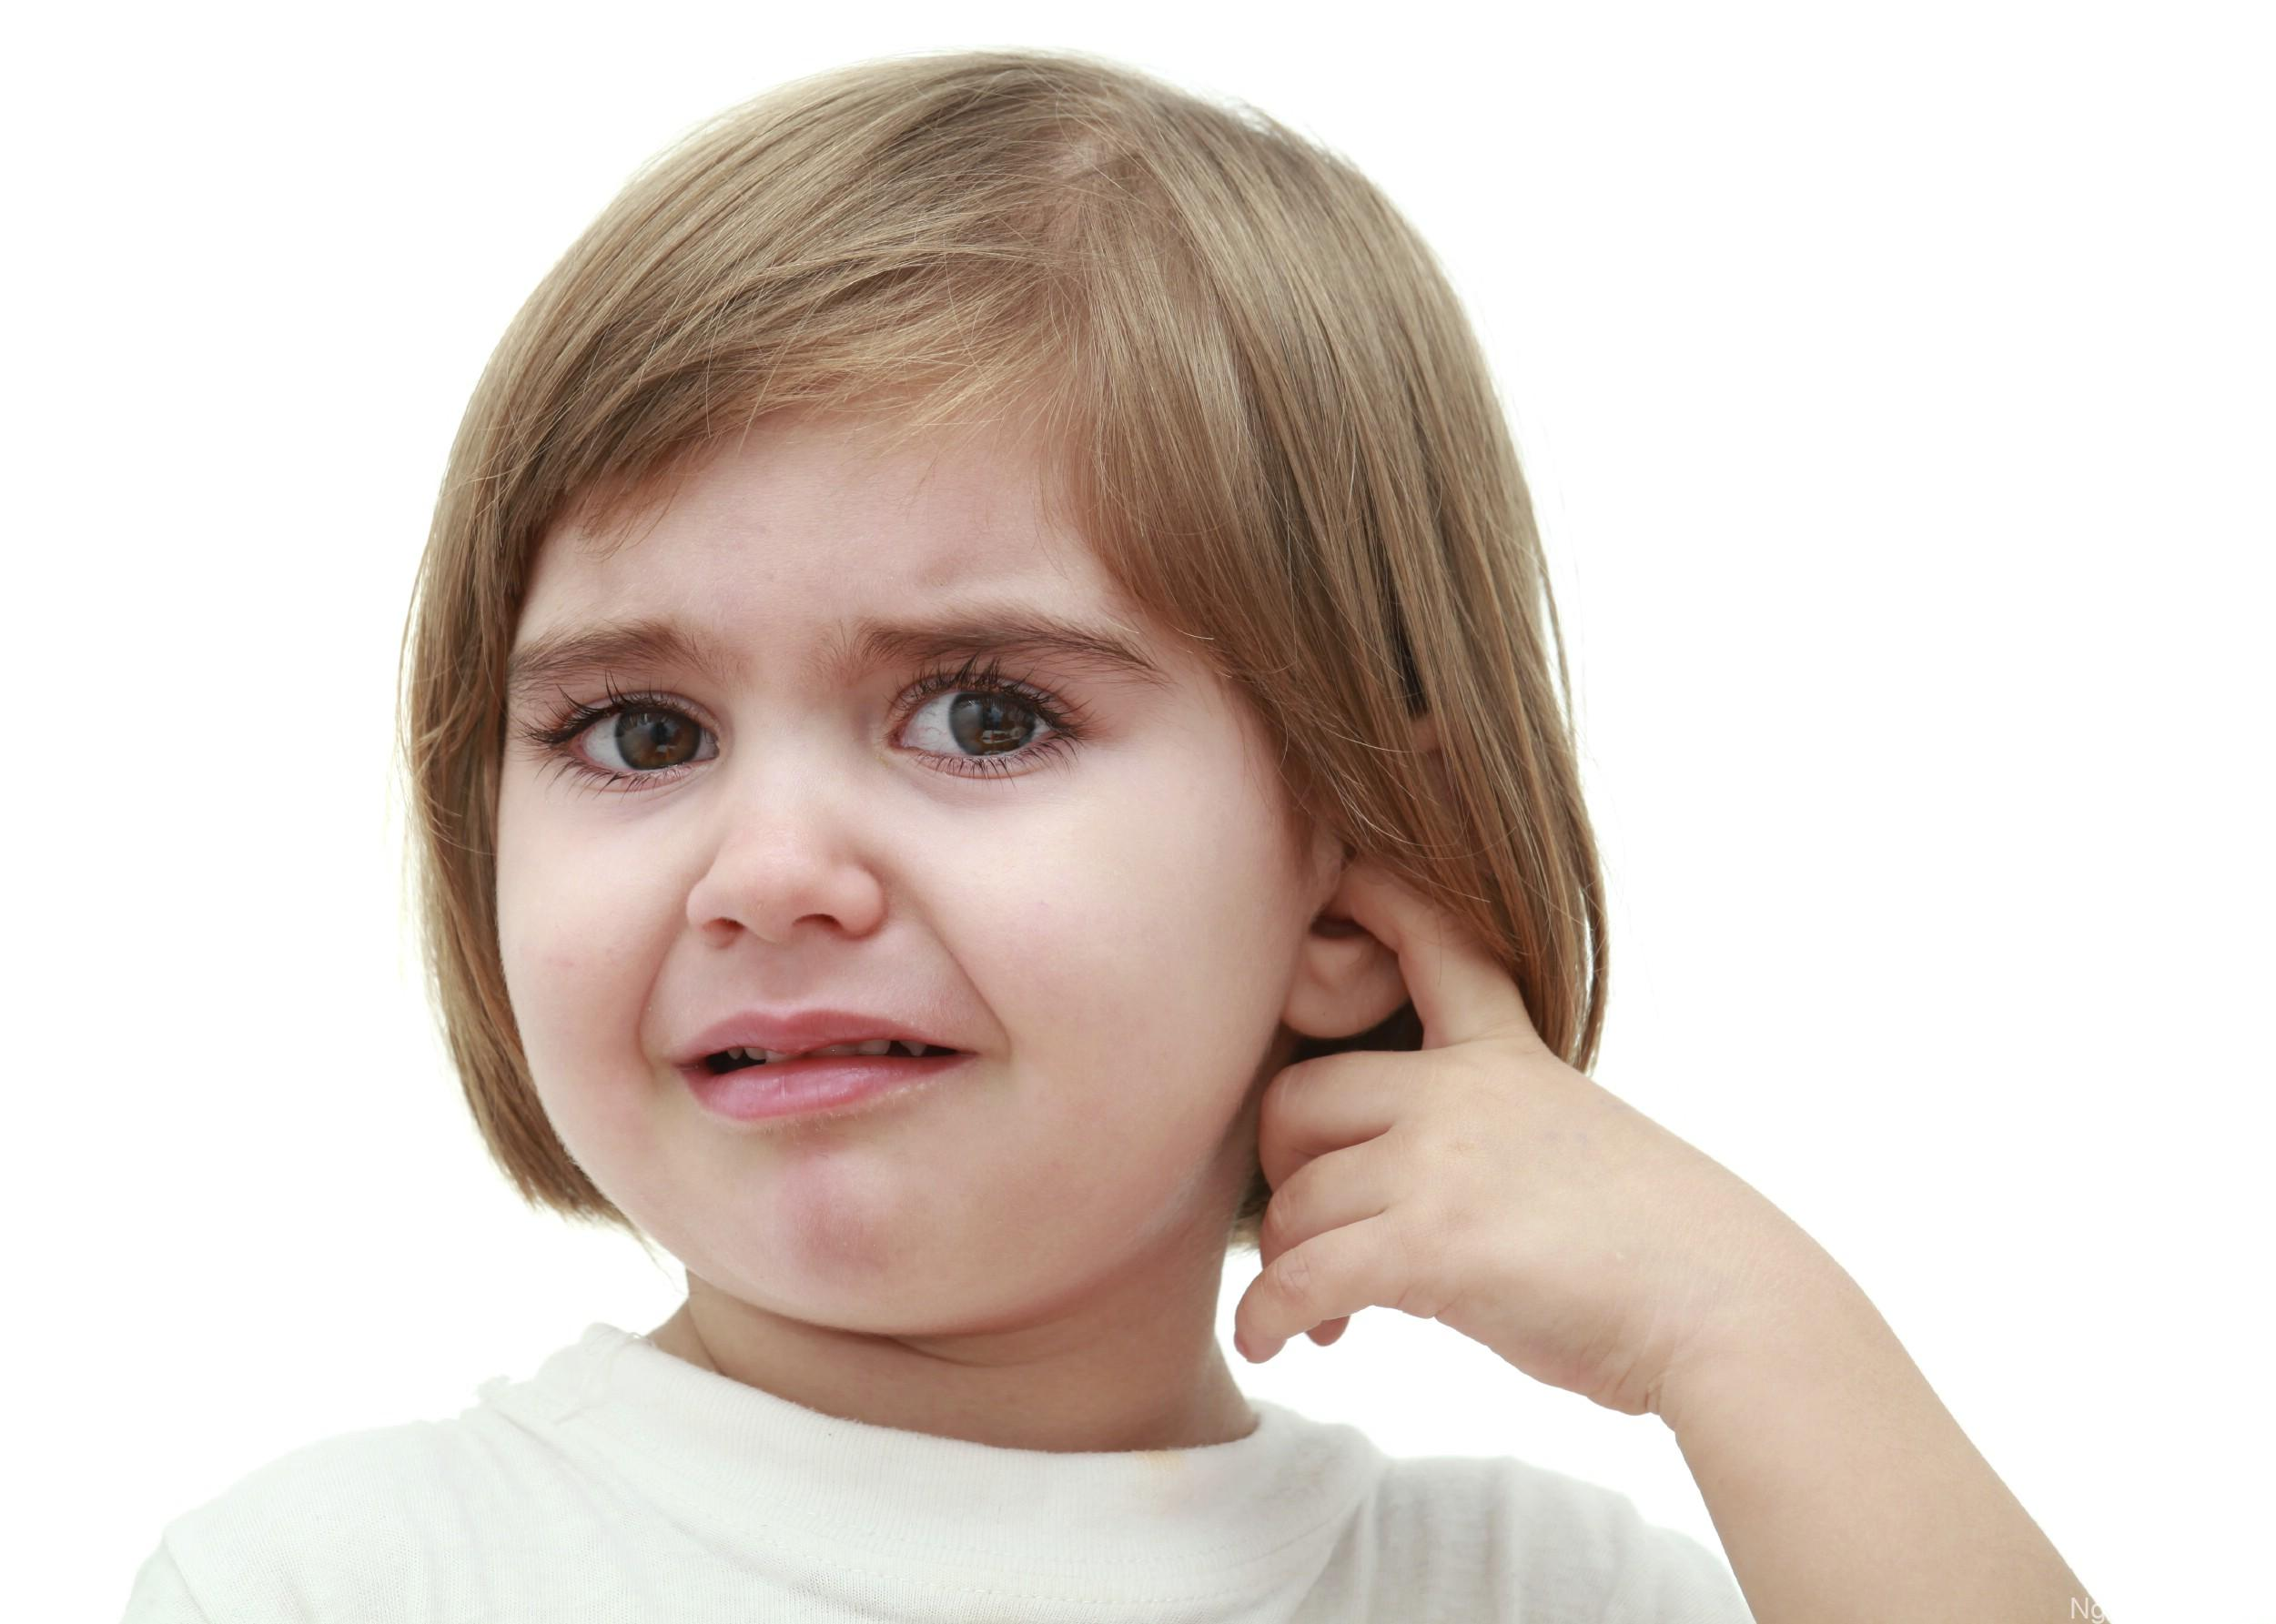 Trẻ bị viêm tai